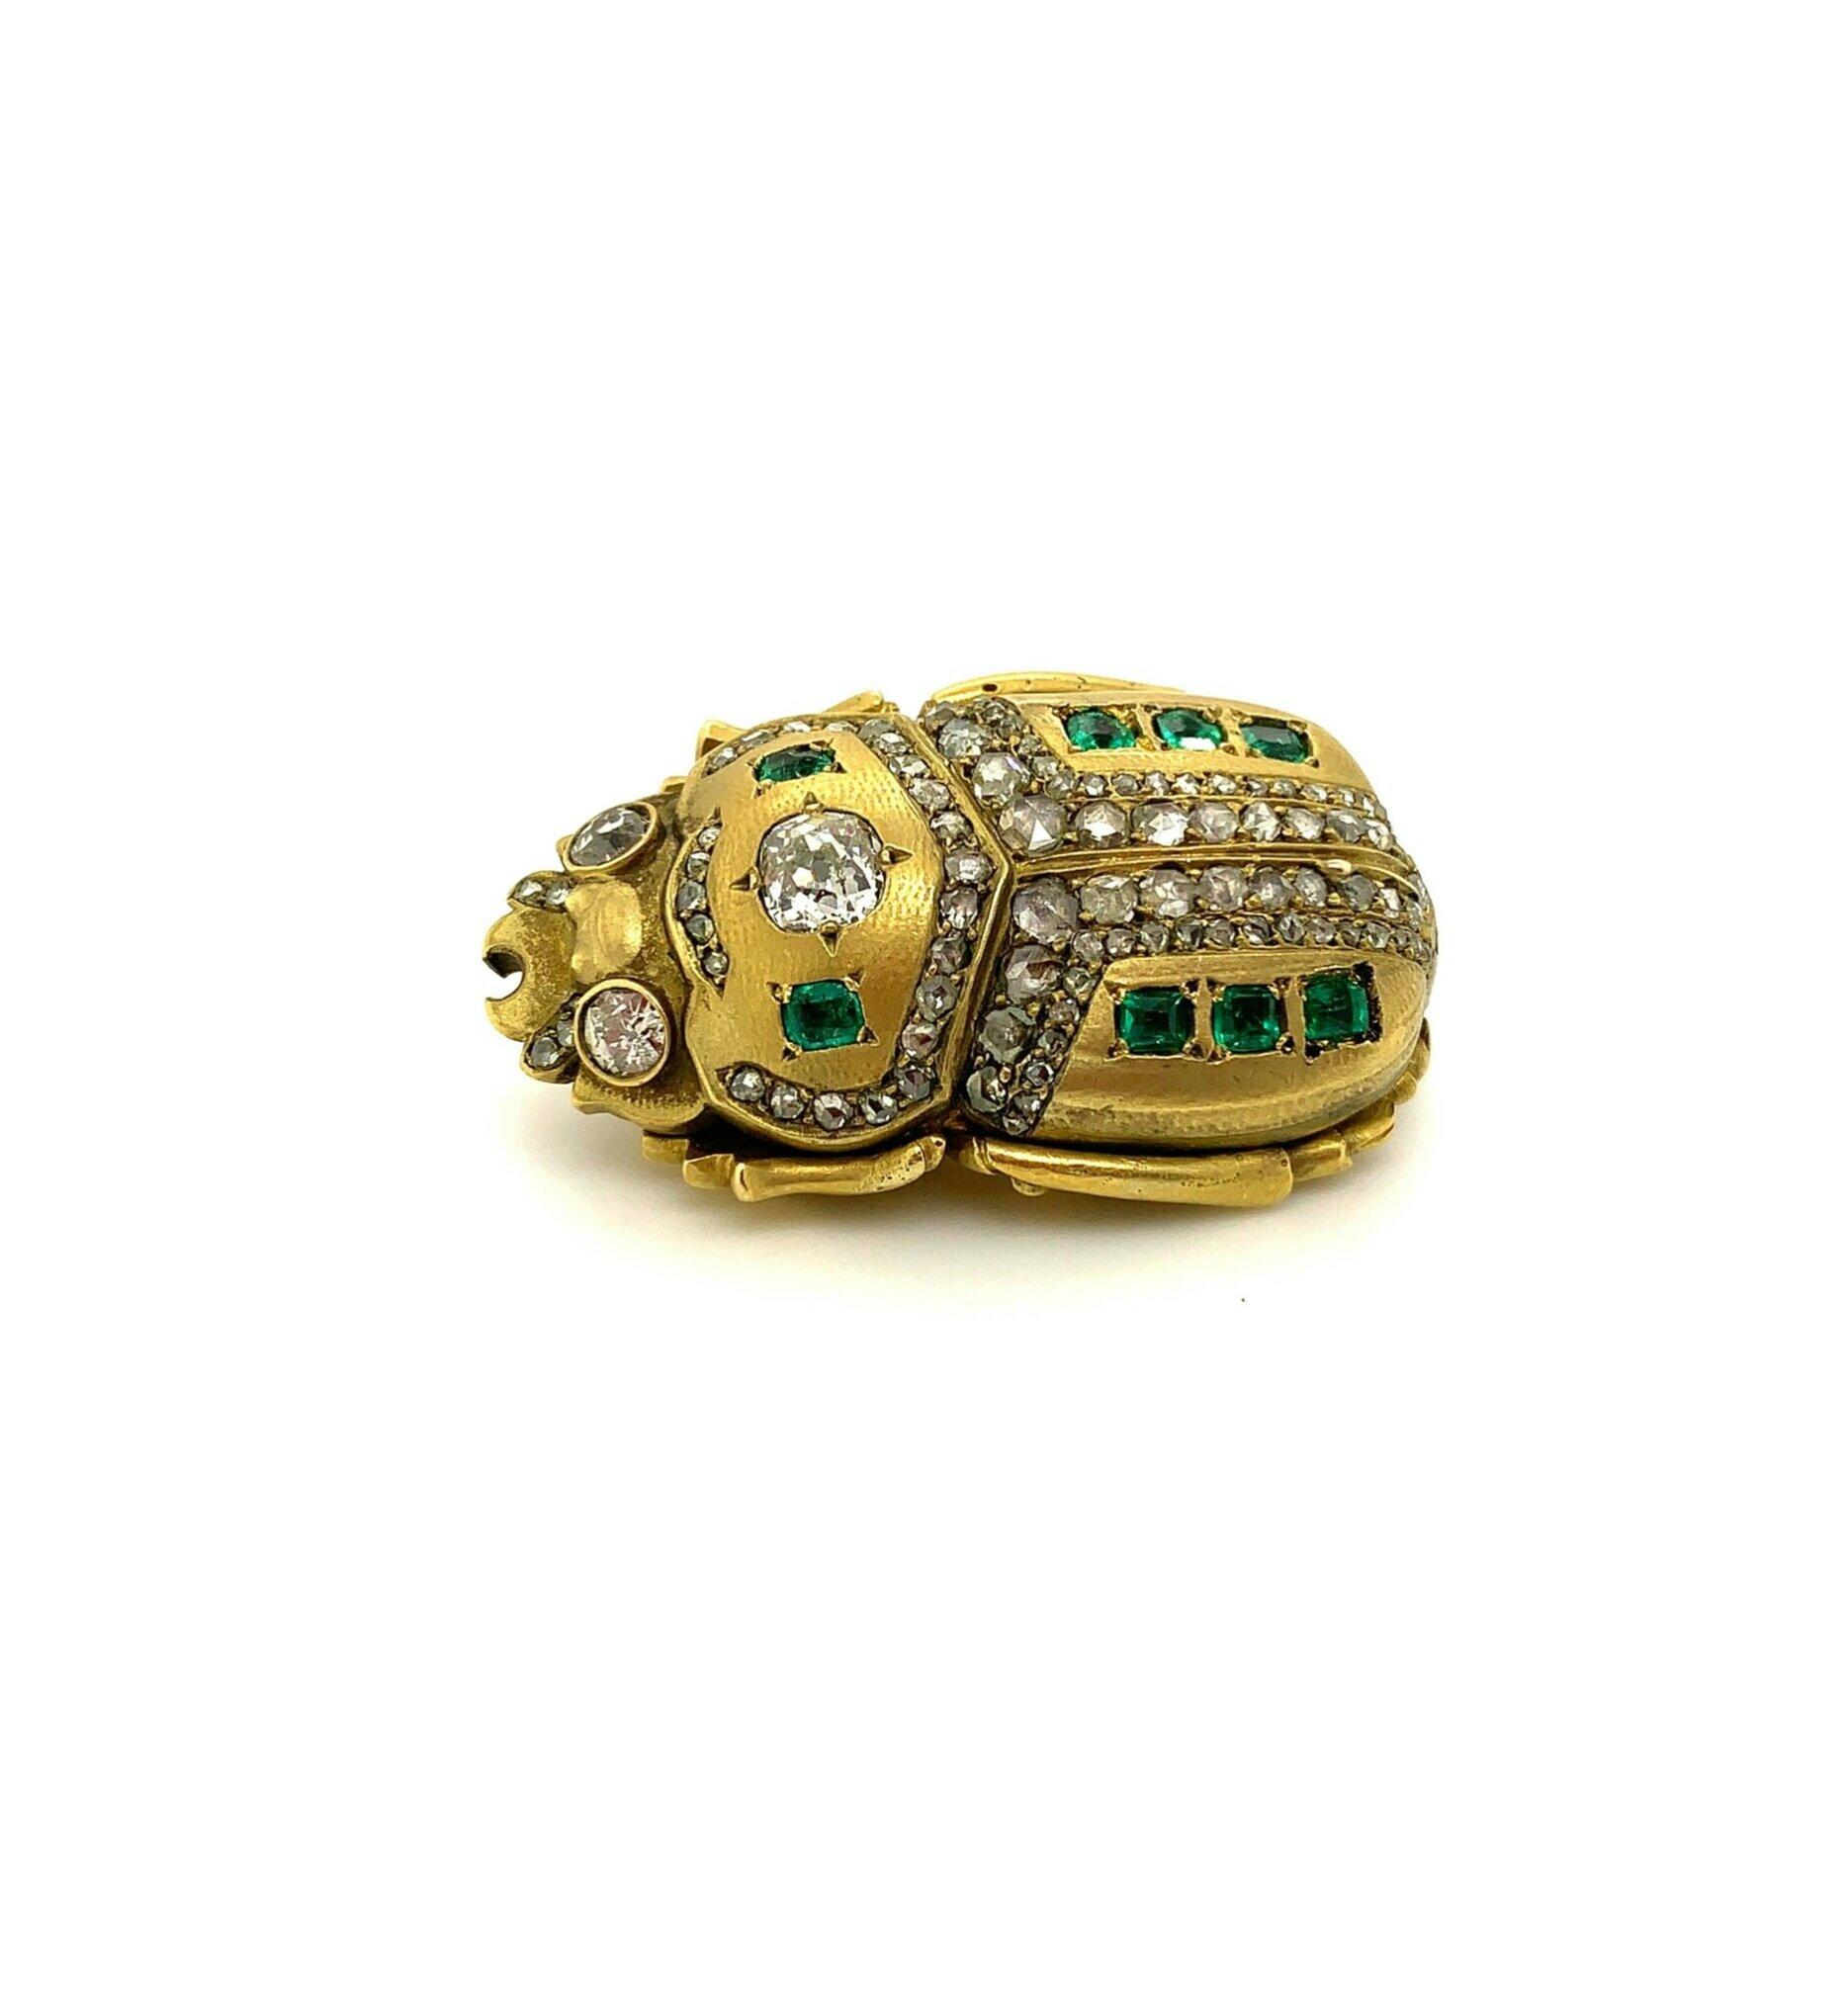 Emerald and Diamond Scarab Brooch   Est. US$ 3,500-4,500